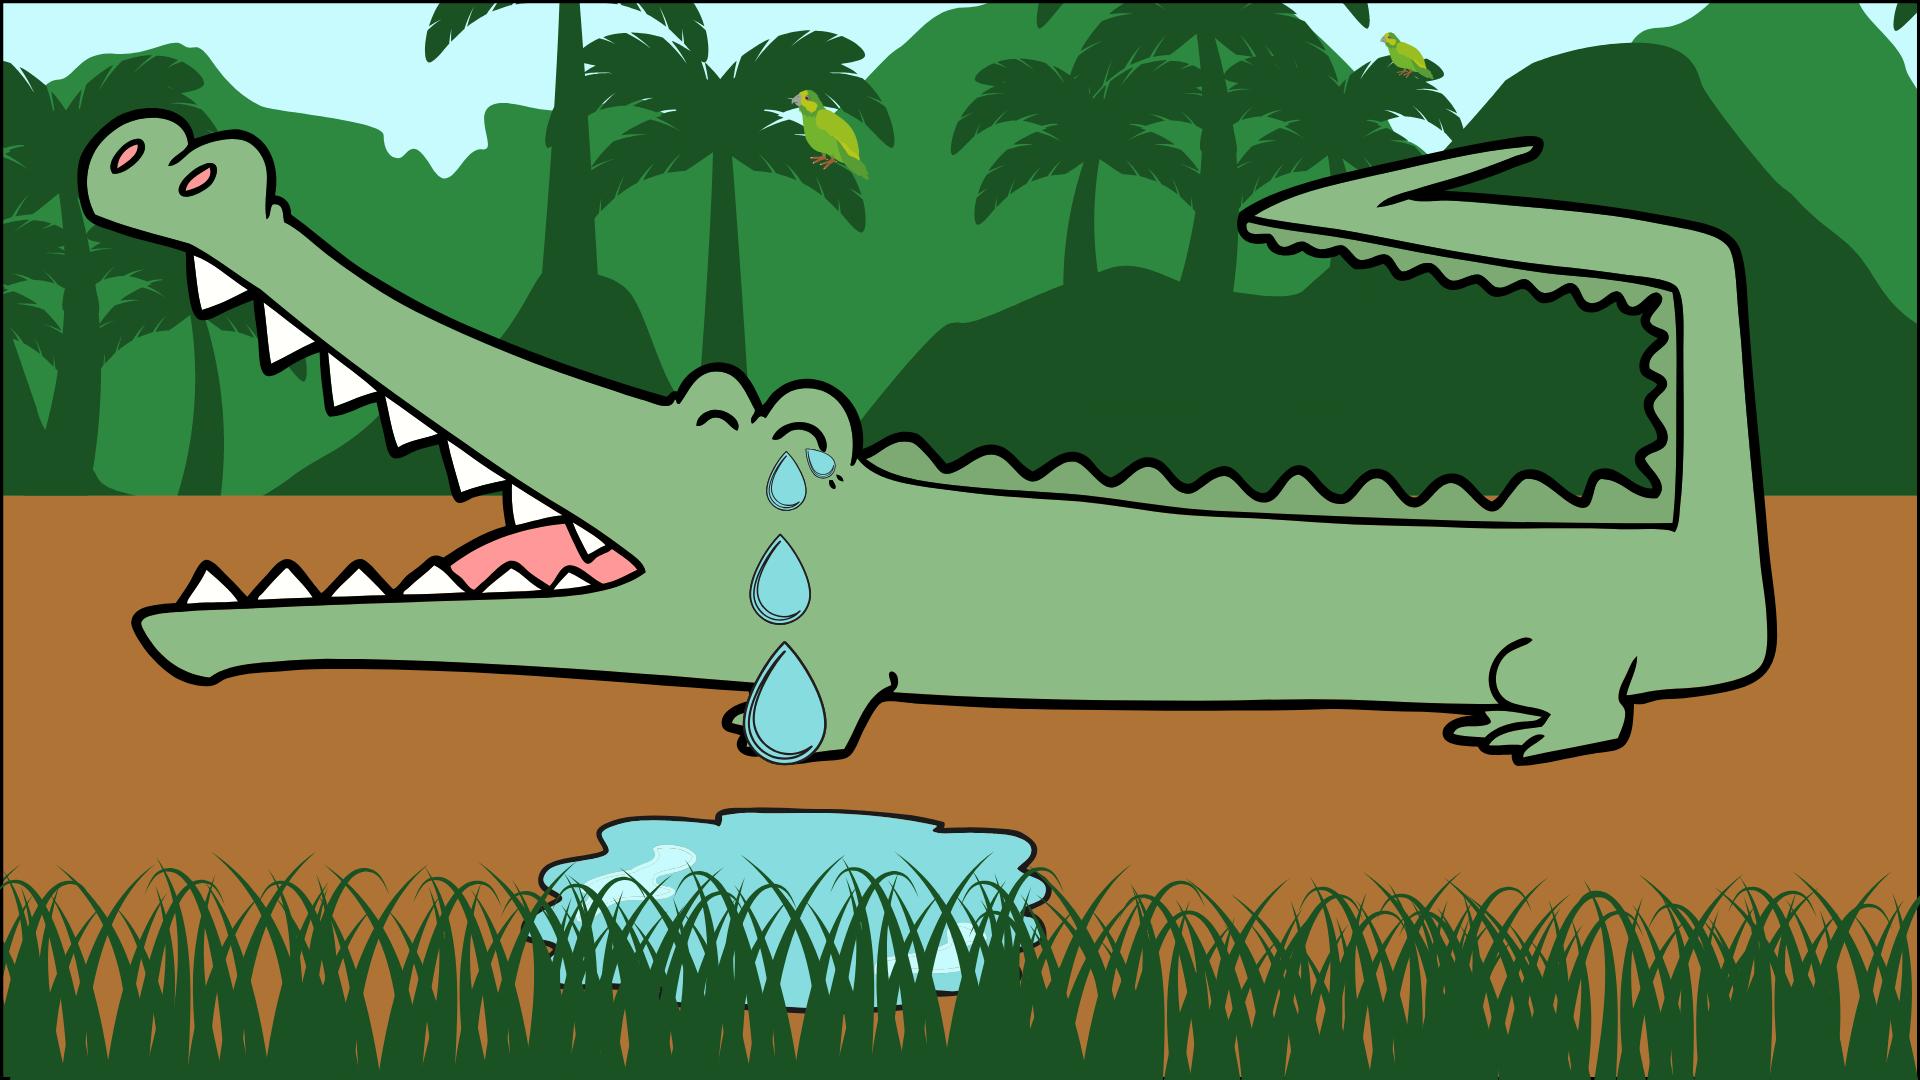 Crocodile crying